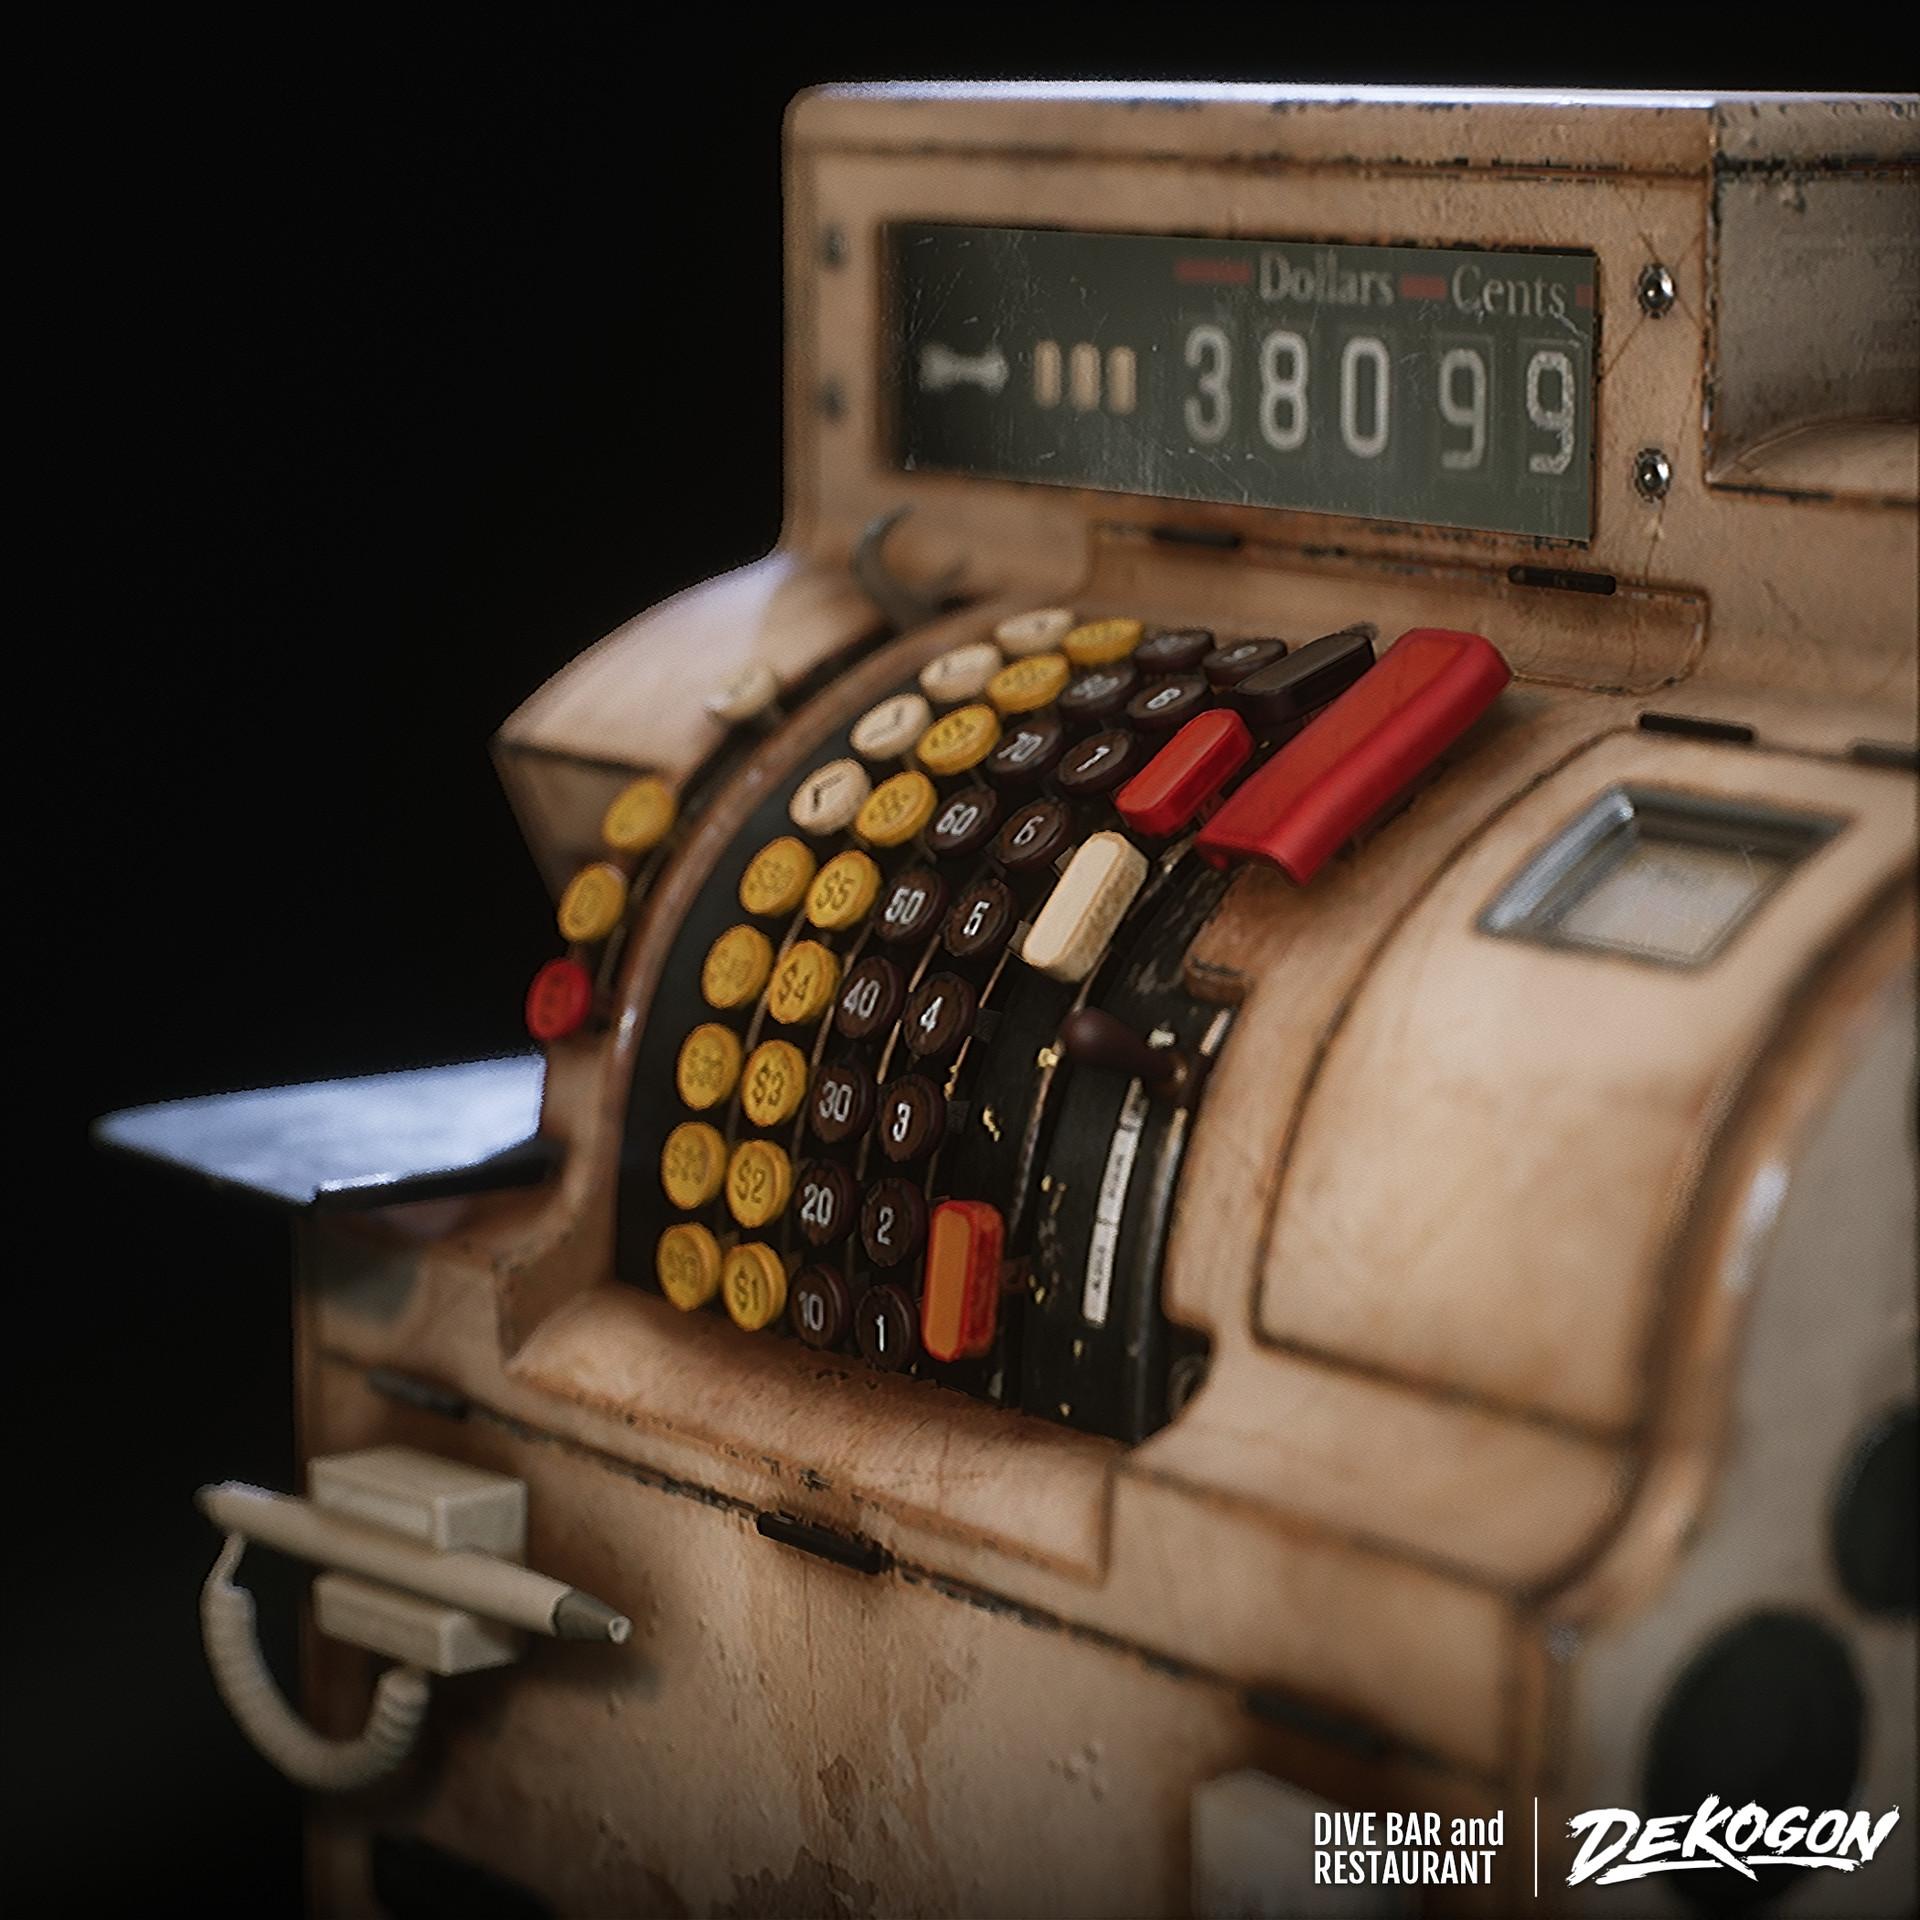 Wahyu nugraha cashregister 01 12